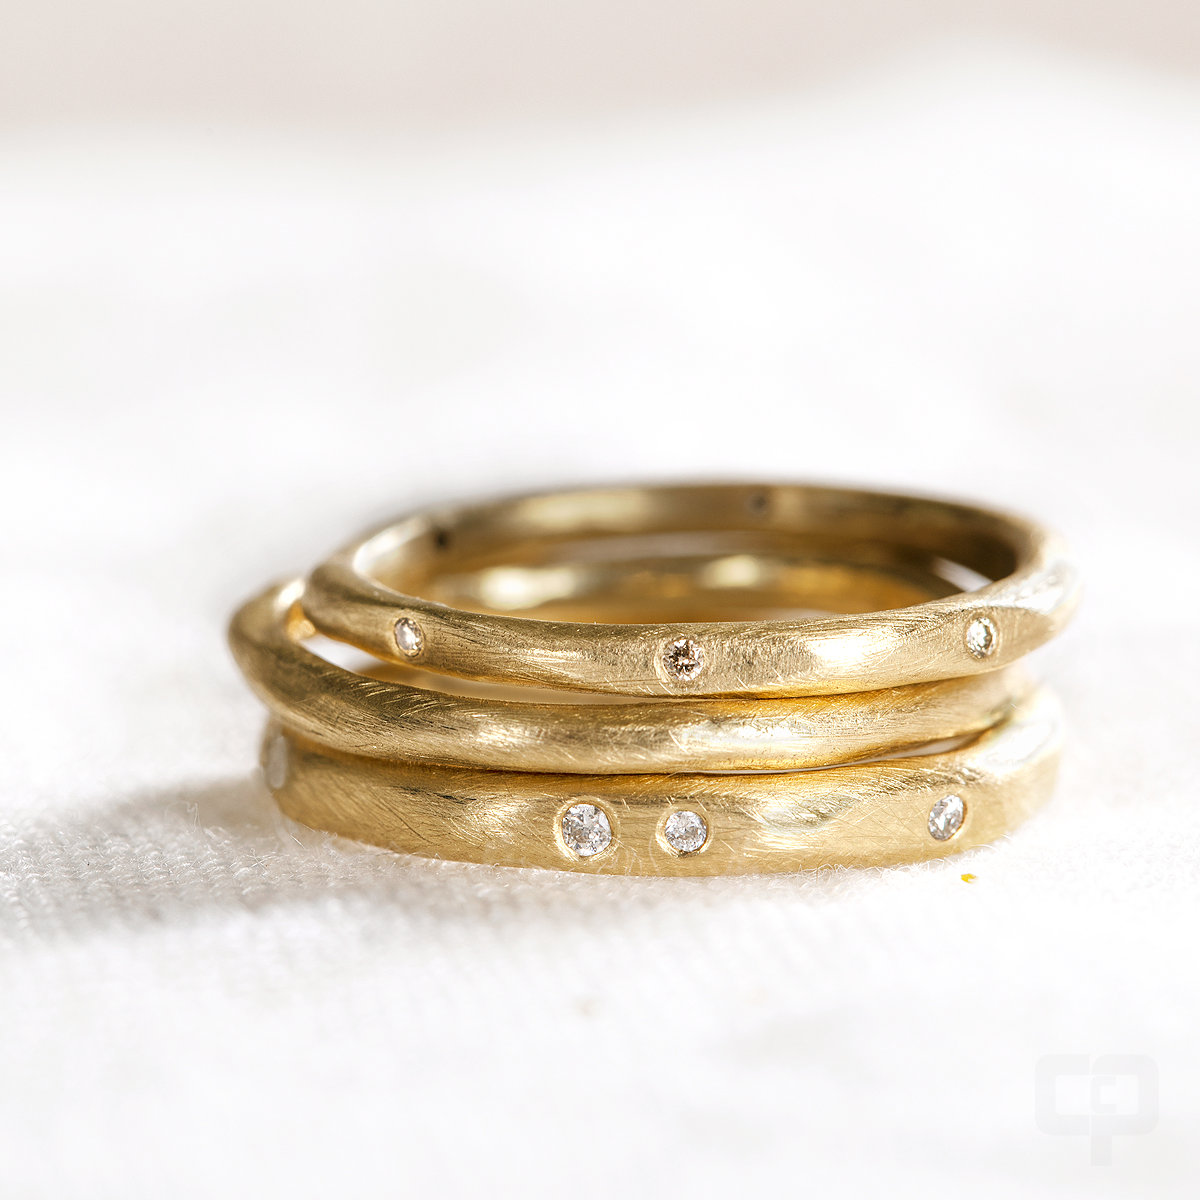 Rework Family Jewelry Consultation